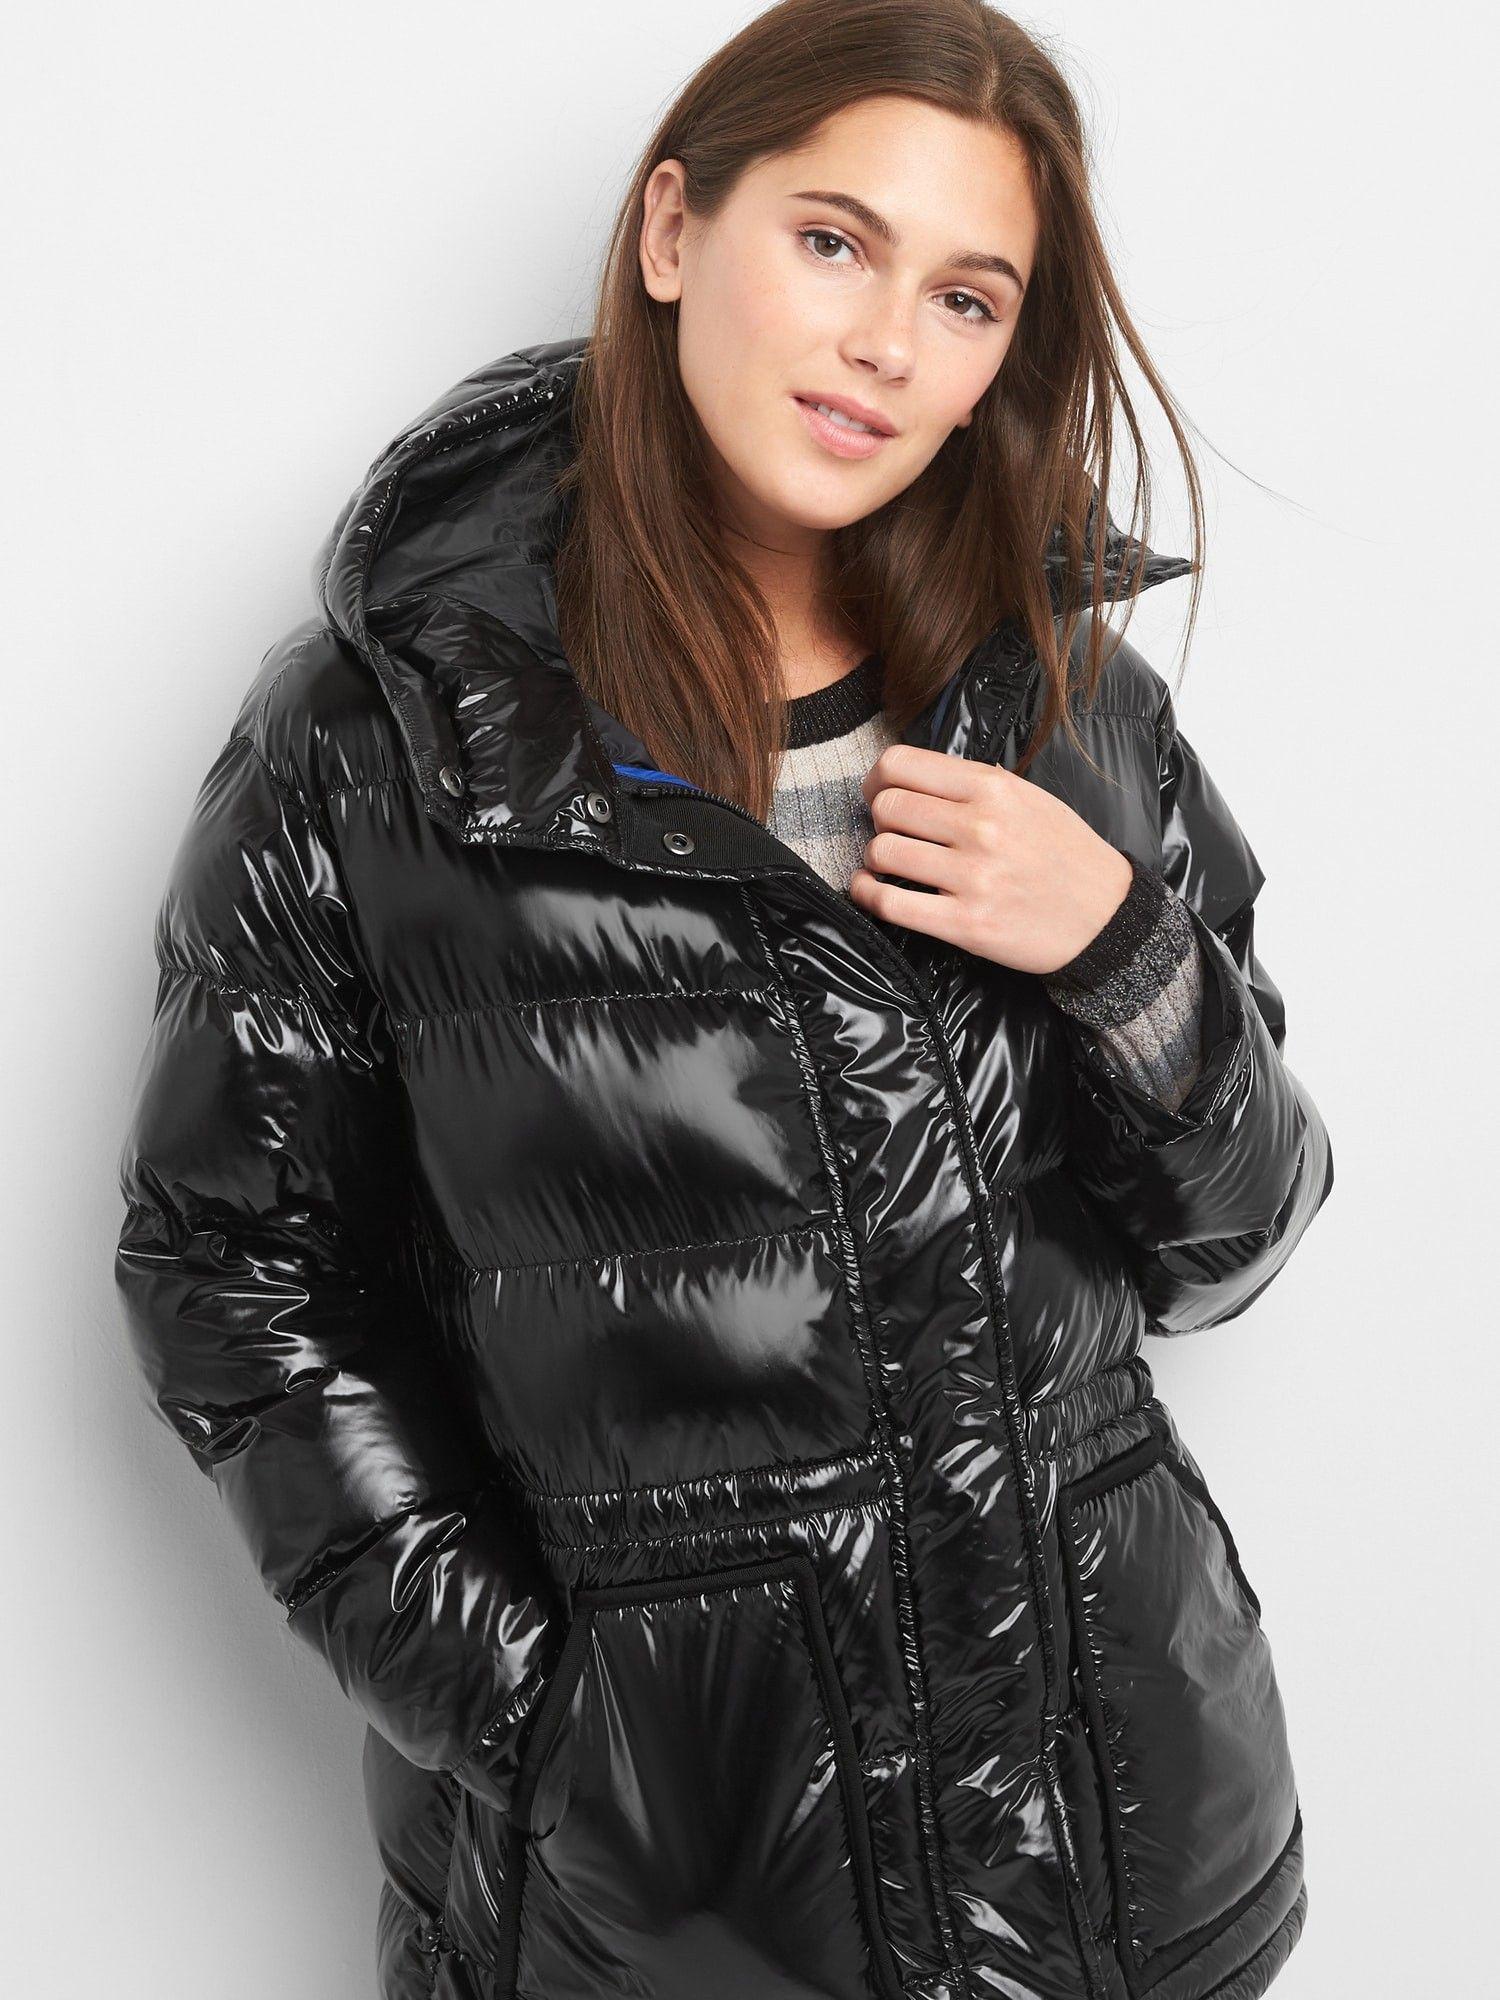 Gap Womens Coldcontrol Max Shine Puffer Jacket Absolute Black Xl Gold Gap Women Jackets Puffer Jackets [ 2000 x 1500 Pixel ]